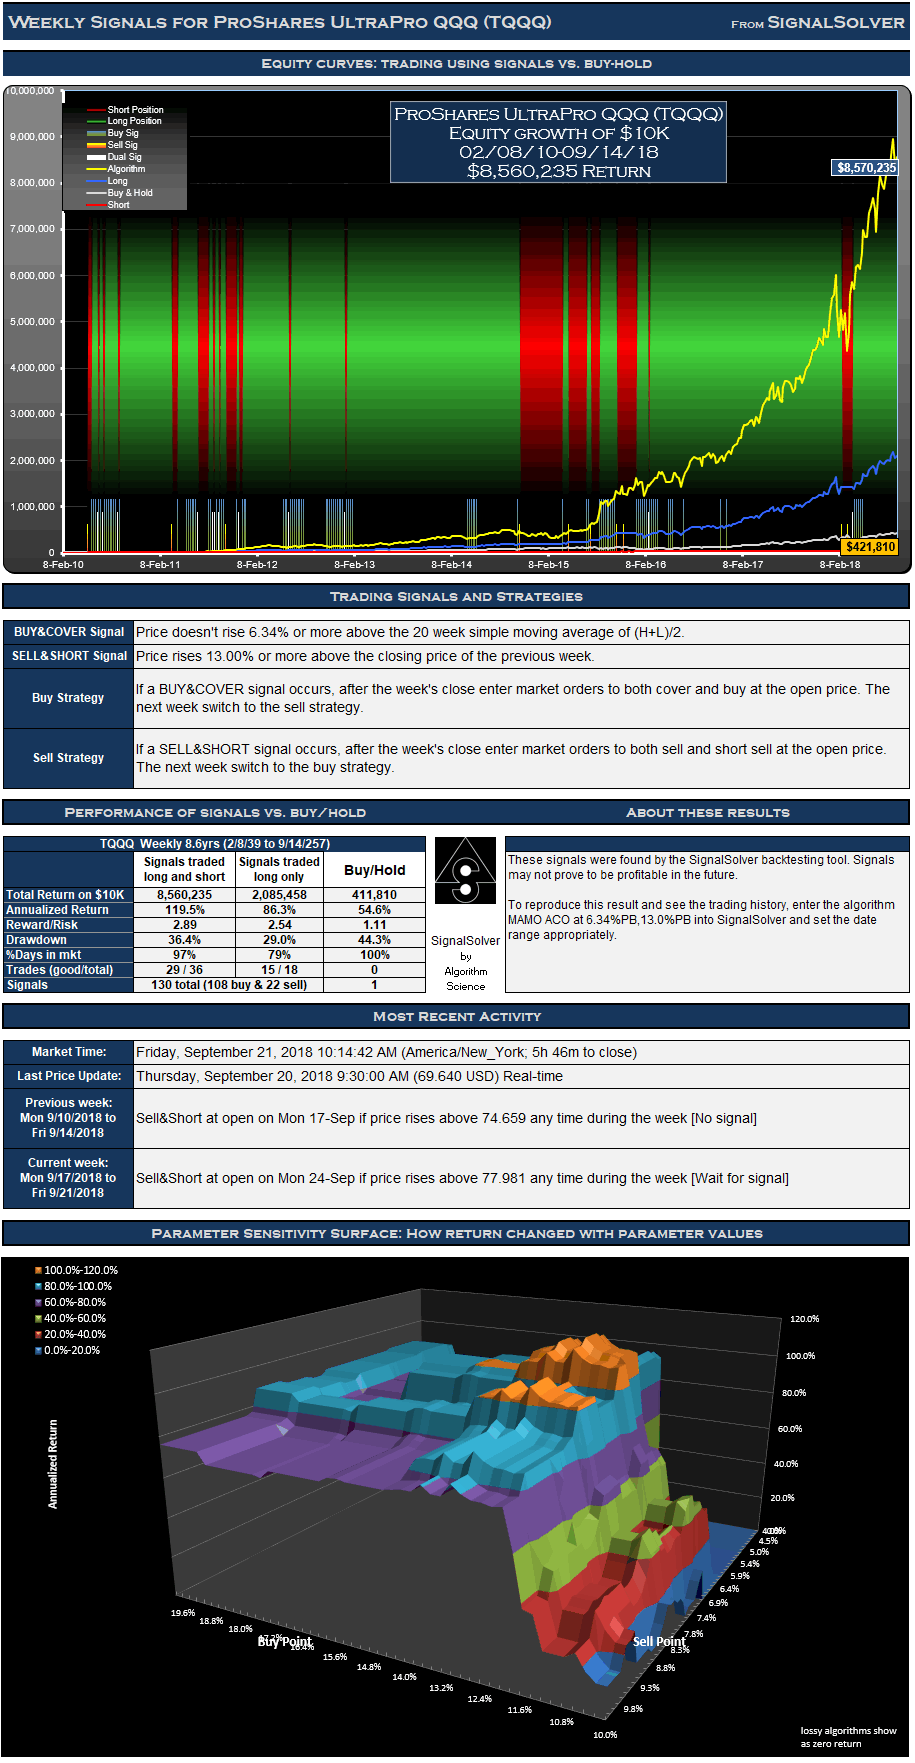 TQQQ Signals Weekly